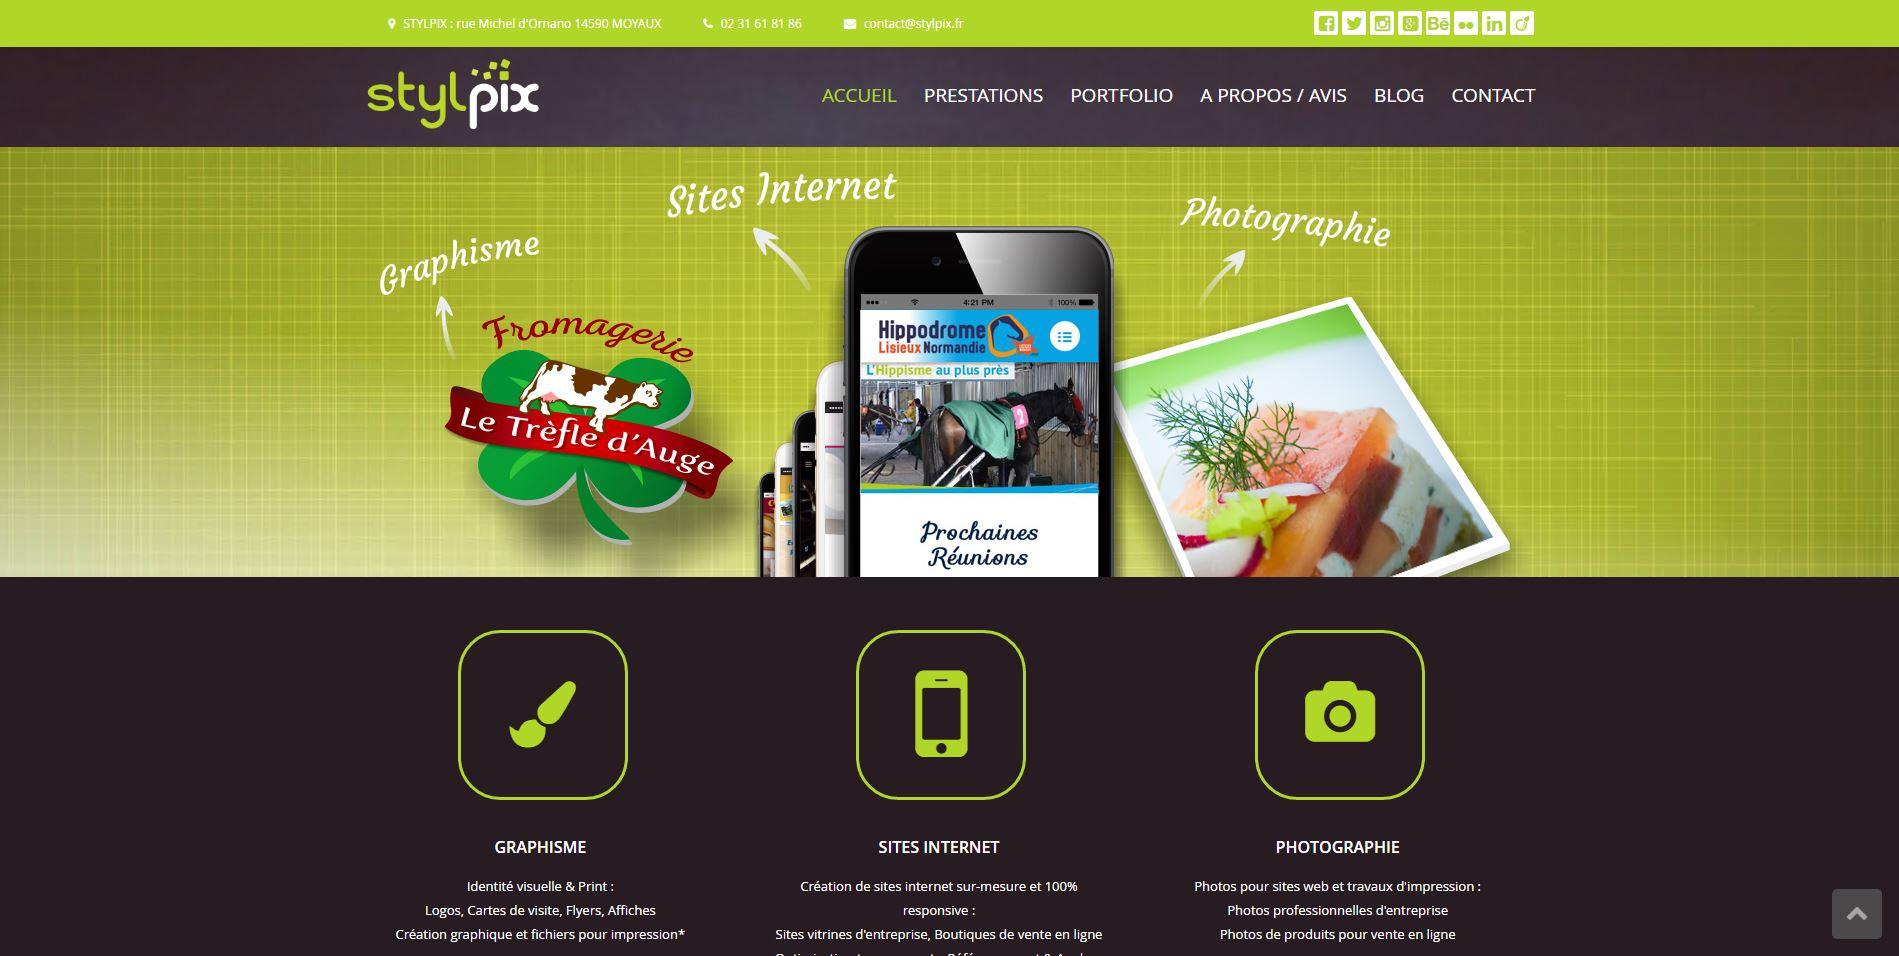 stylpix sites internet lisieux calvados pays dauge